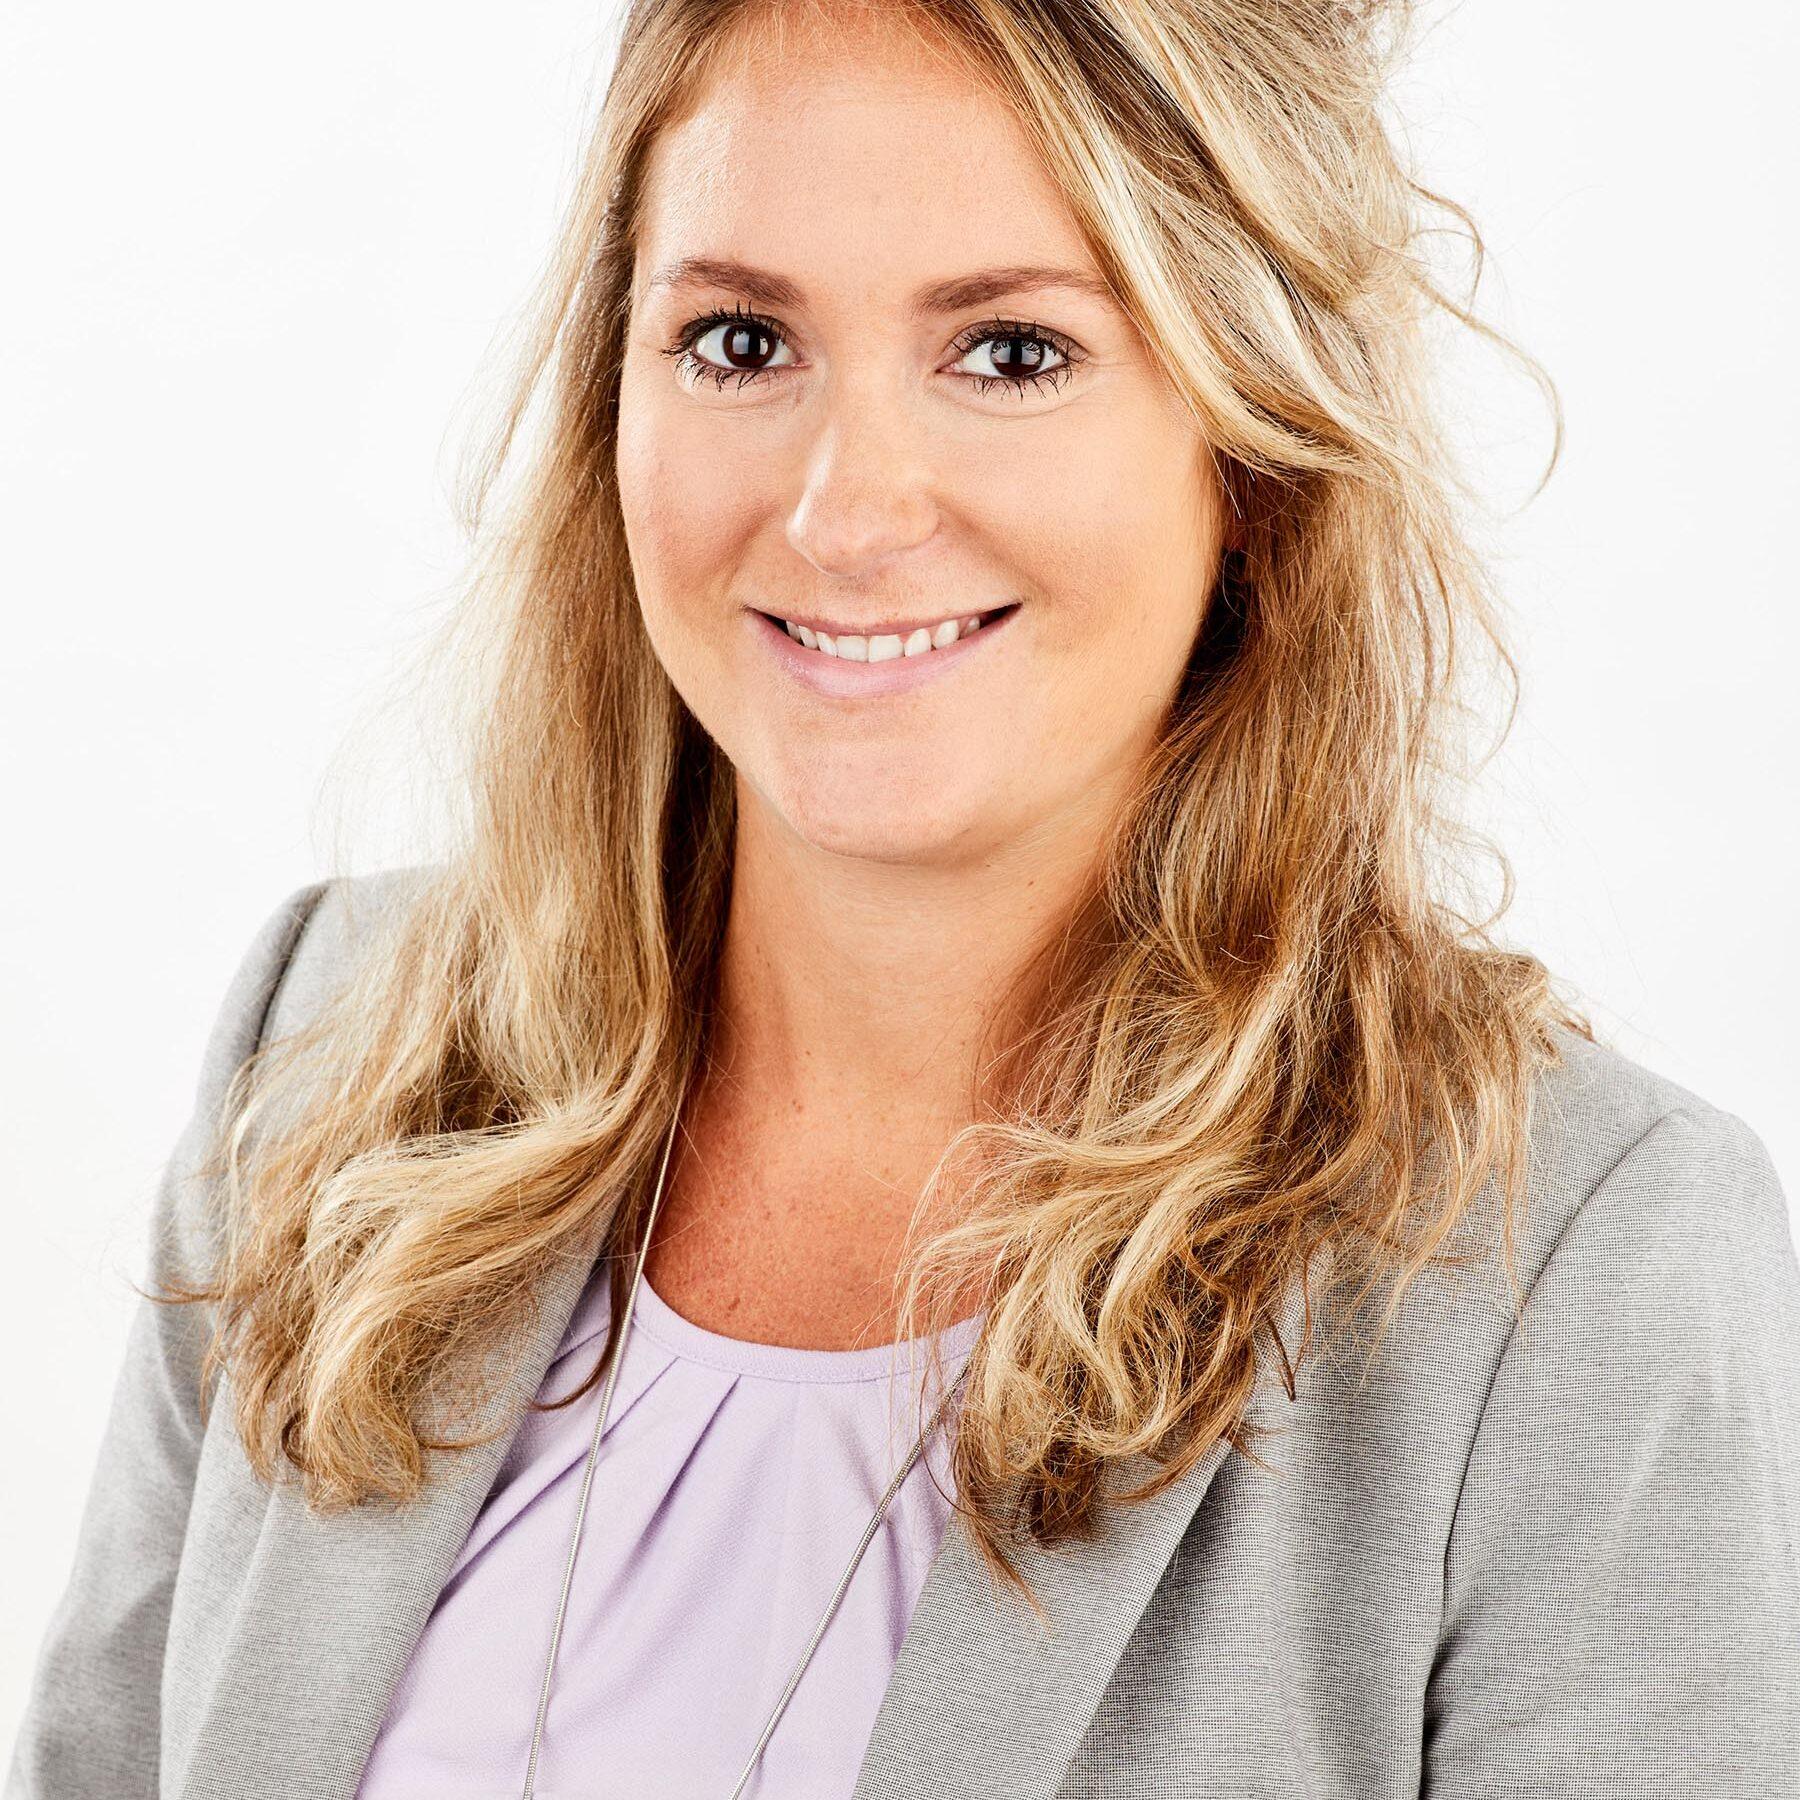 Sarah Mercile Adjointe des ressources humaines